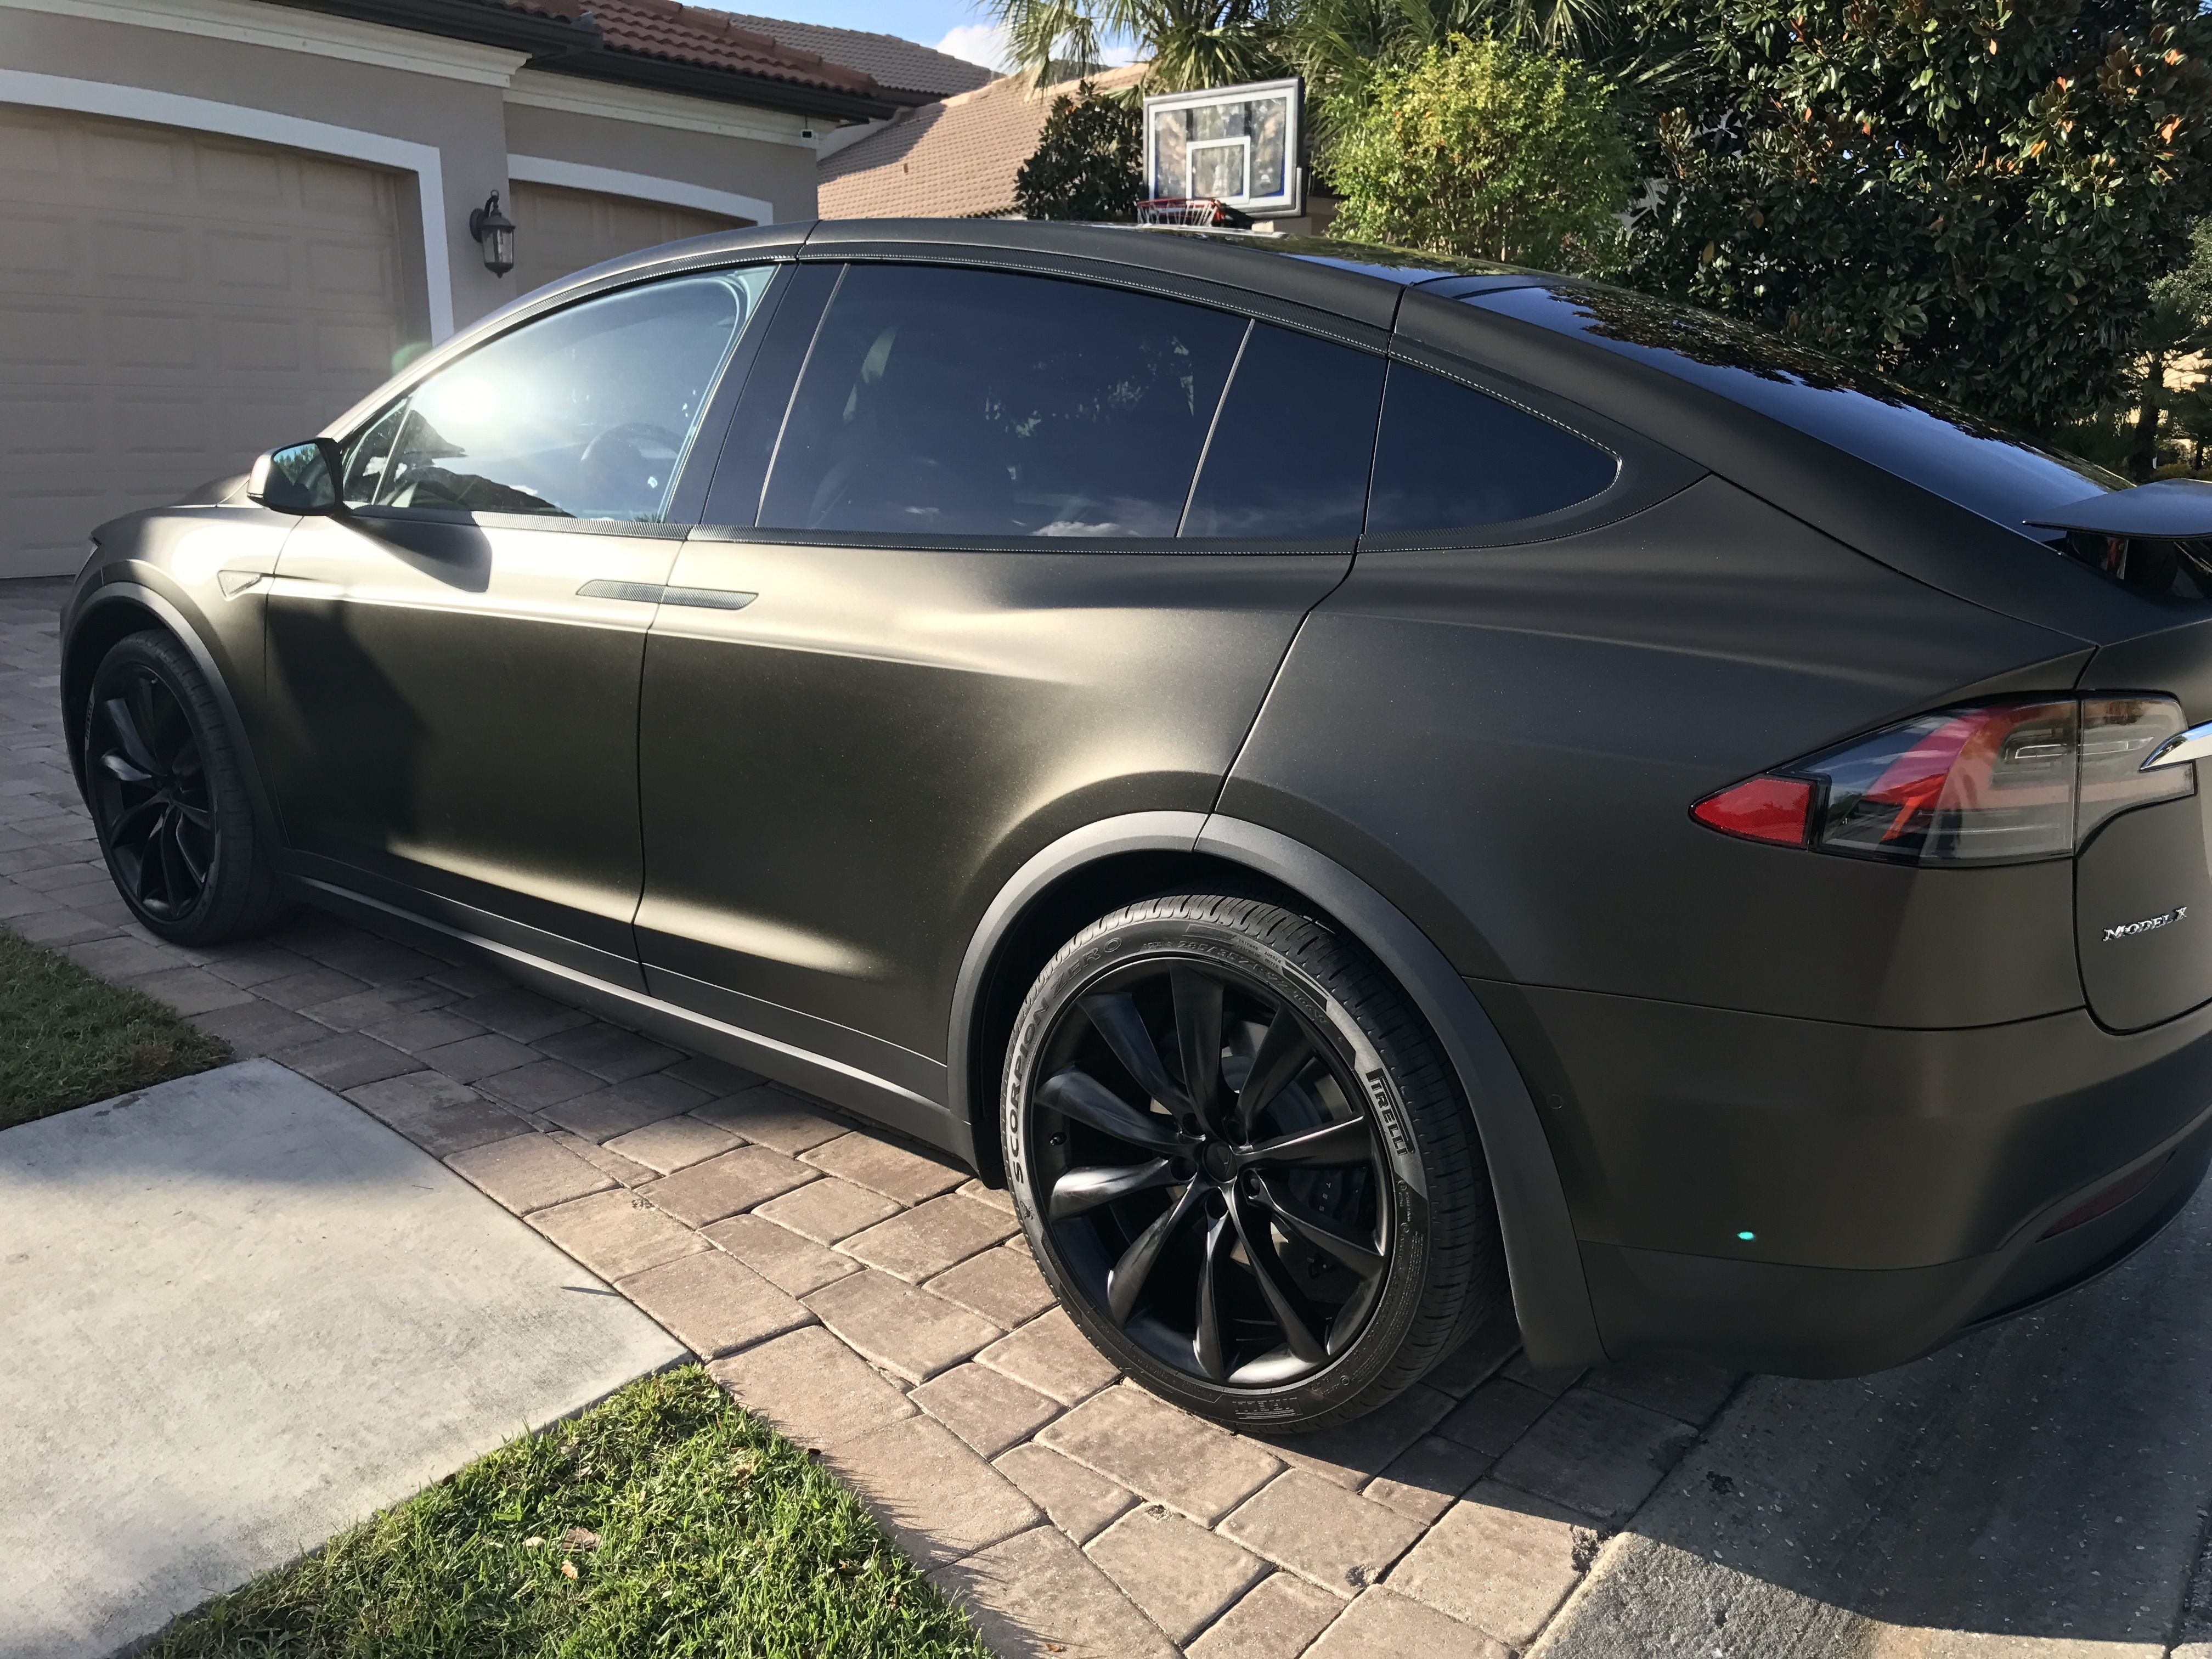 Tesla Model X Black Satin Gold Dust Vinyl Wrap With Carbon Fiber Accents On Chrome And All 6 Seat Backs Awesome Post Vinyl Wrap Car Tesla Model X Vinyl Wrap